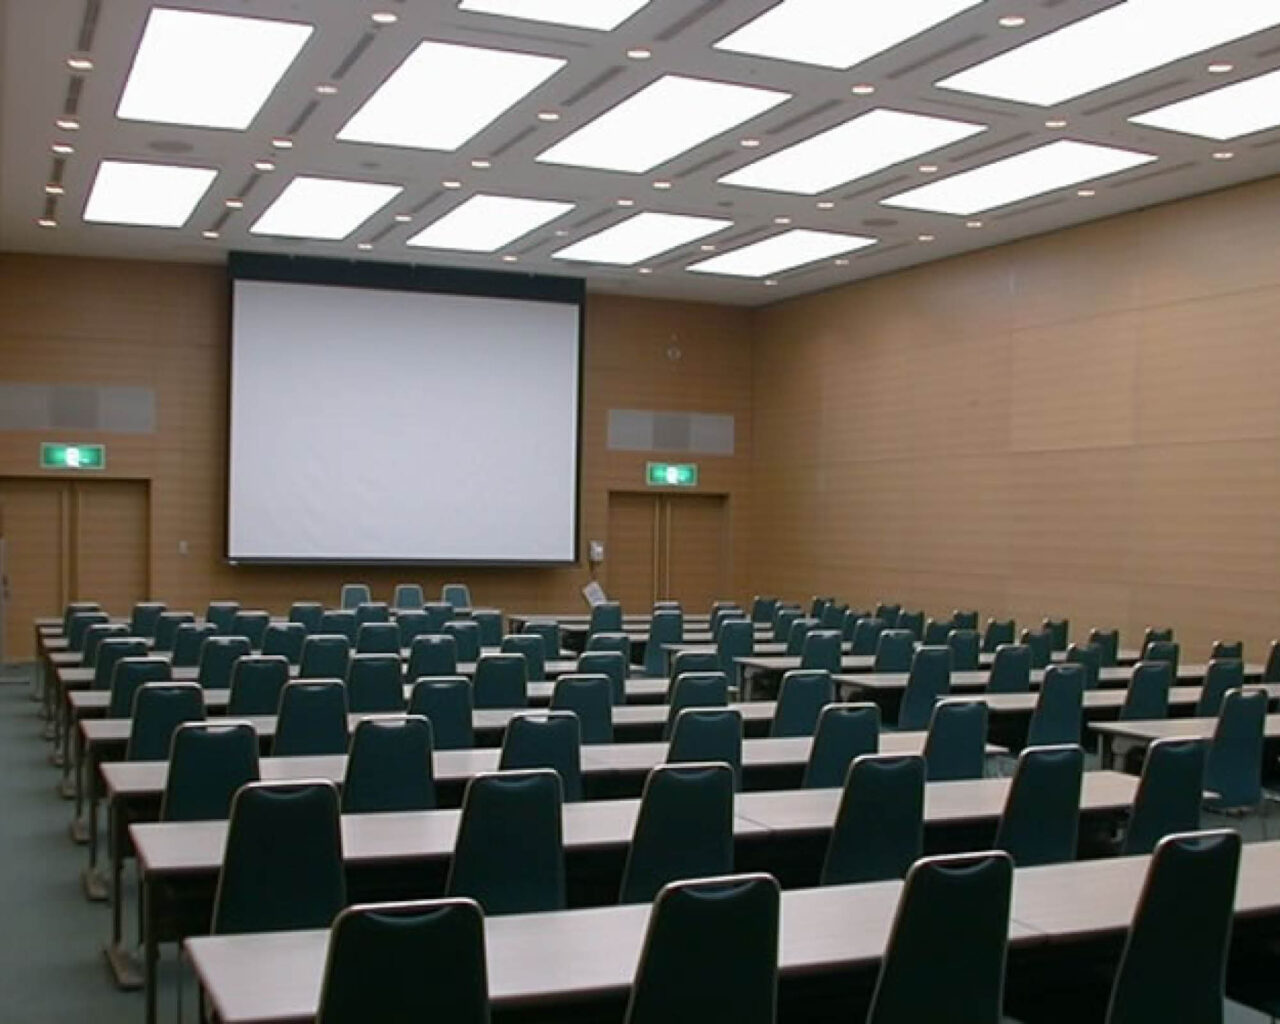 https://www.shizuoka-cb.com/wp-content/uploads/2021/03/photo-venues8-1280x1024.jpg